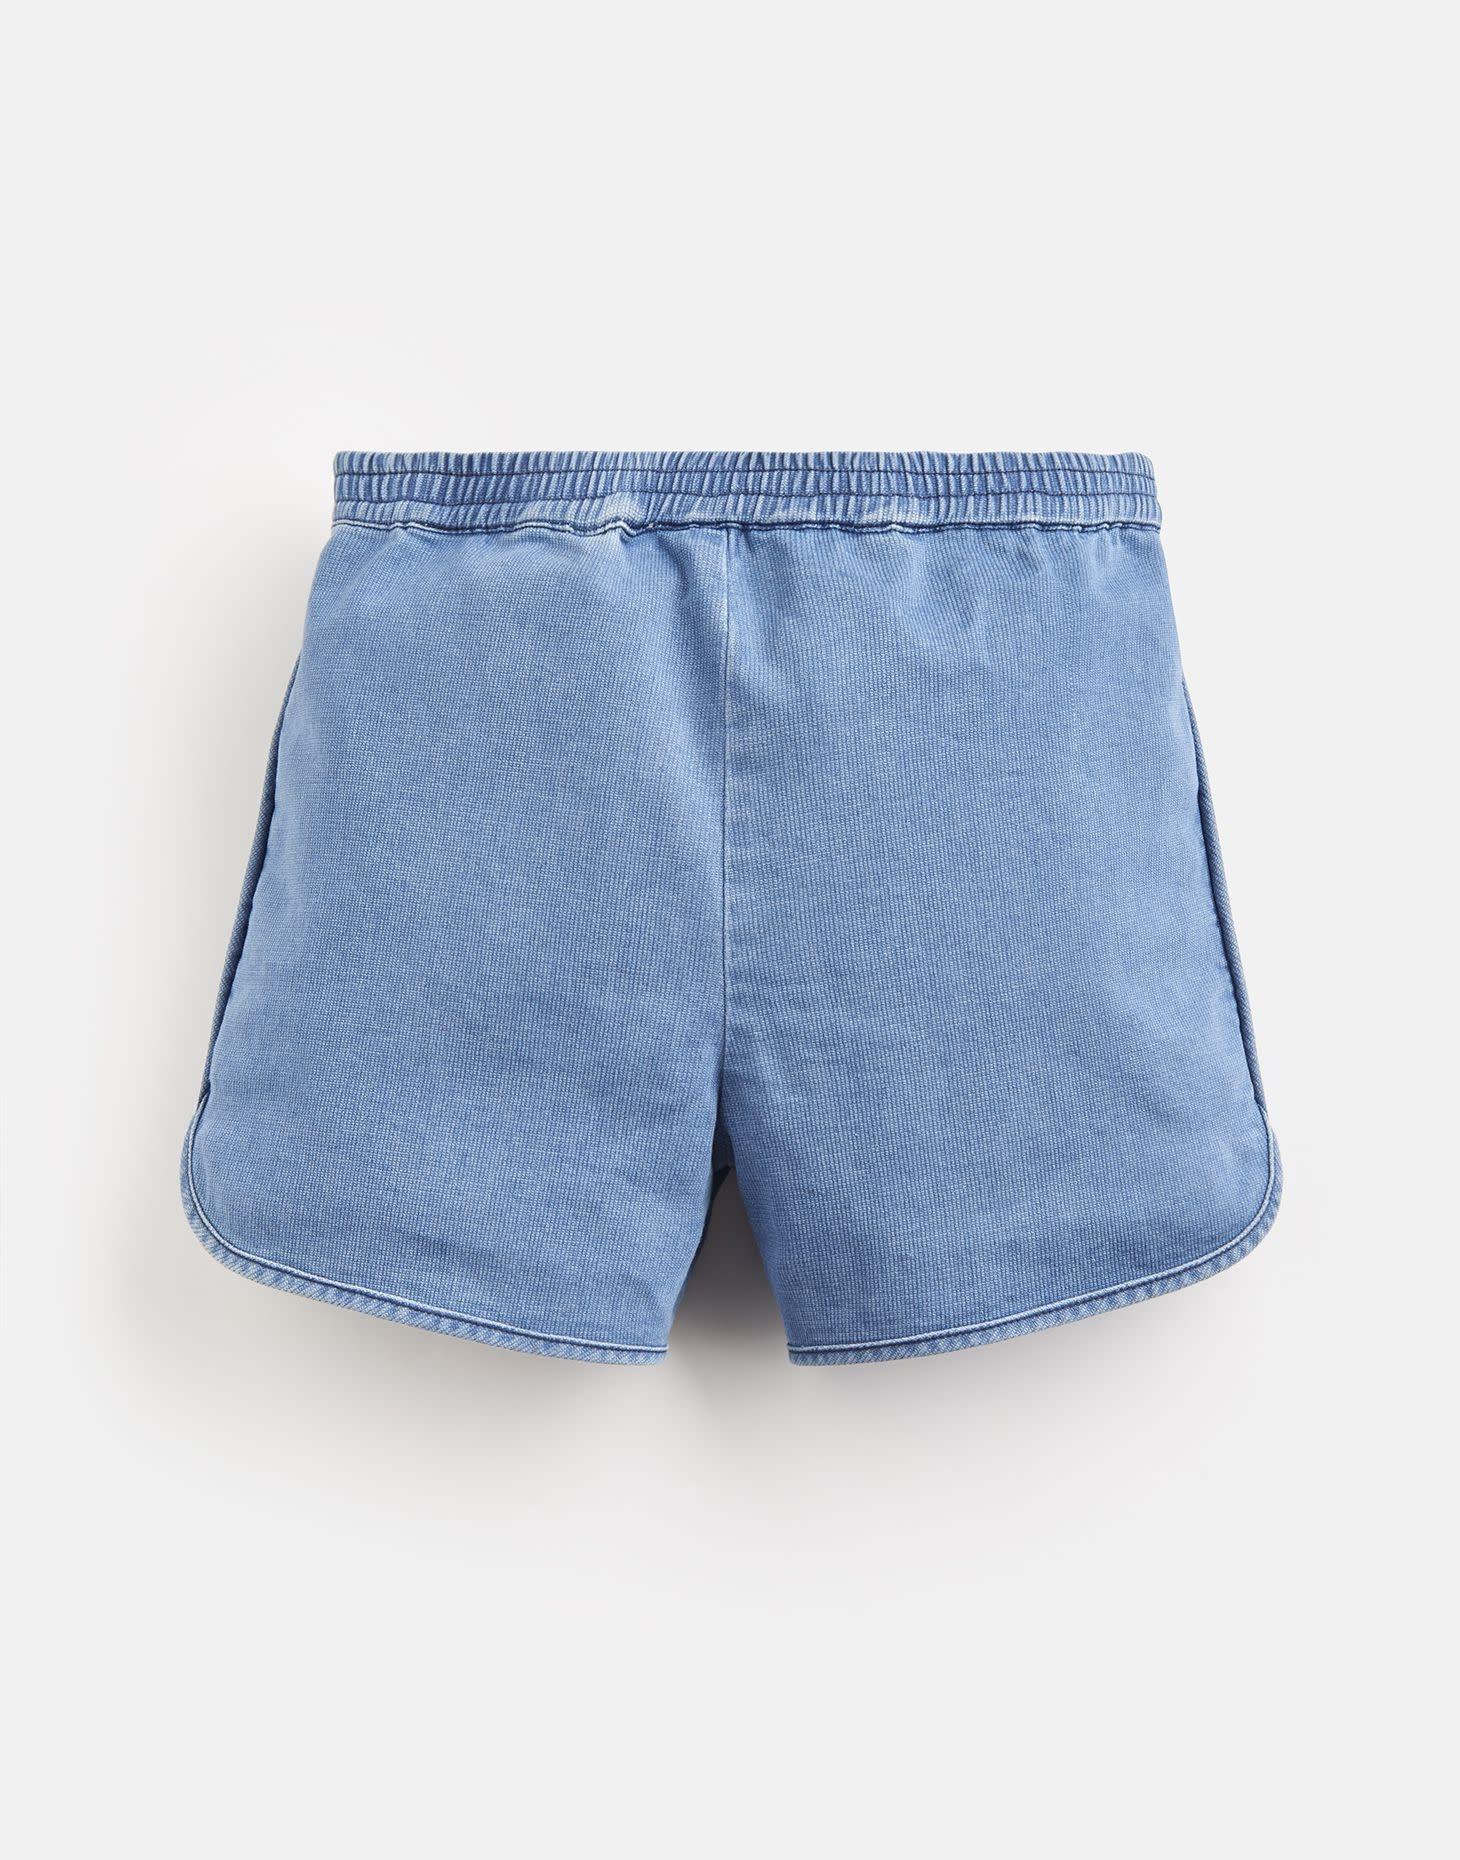 Joules Becca Denim Shorts